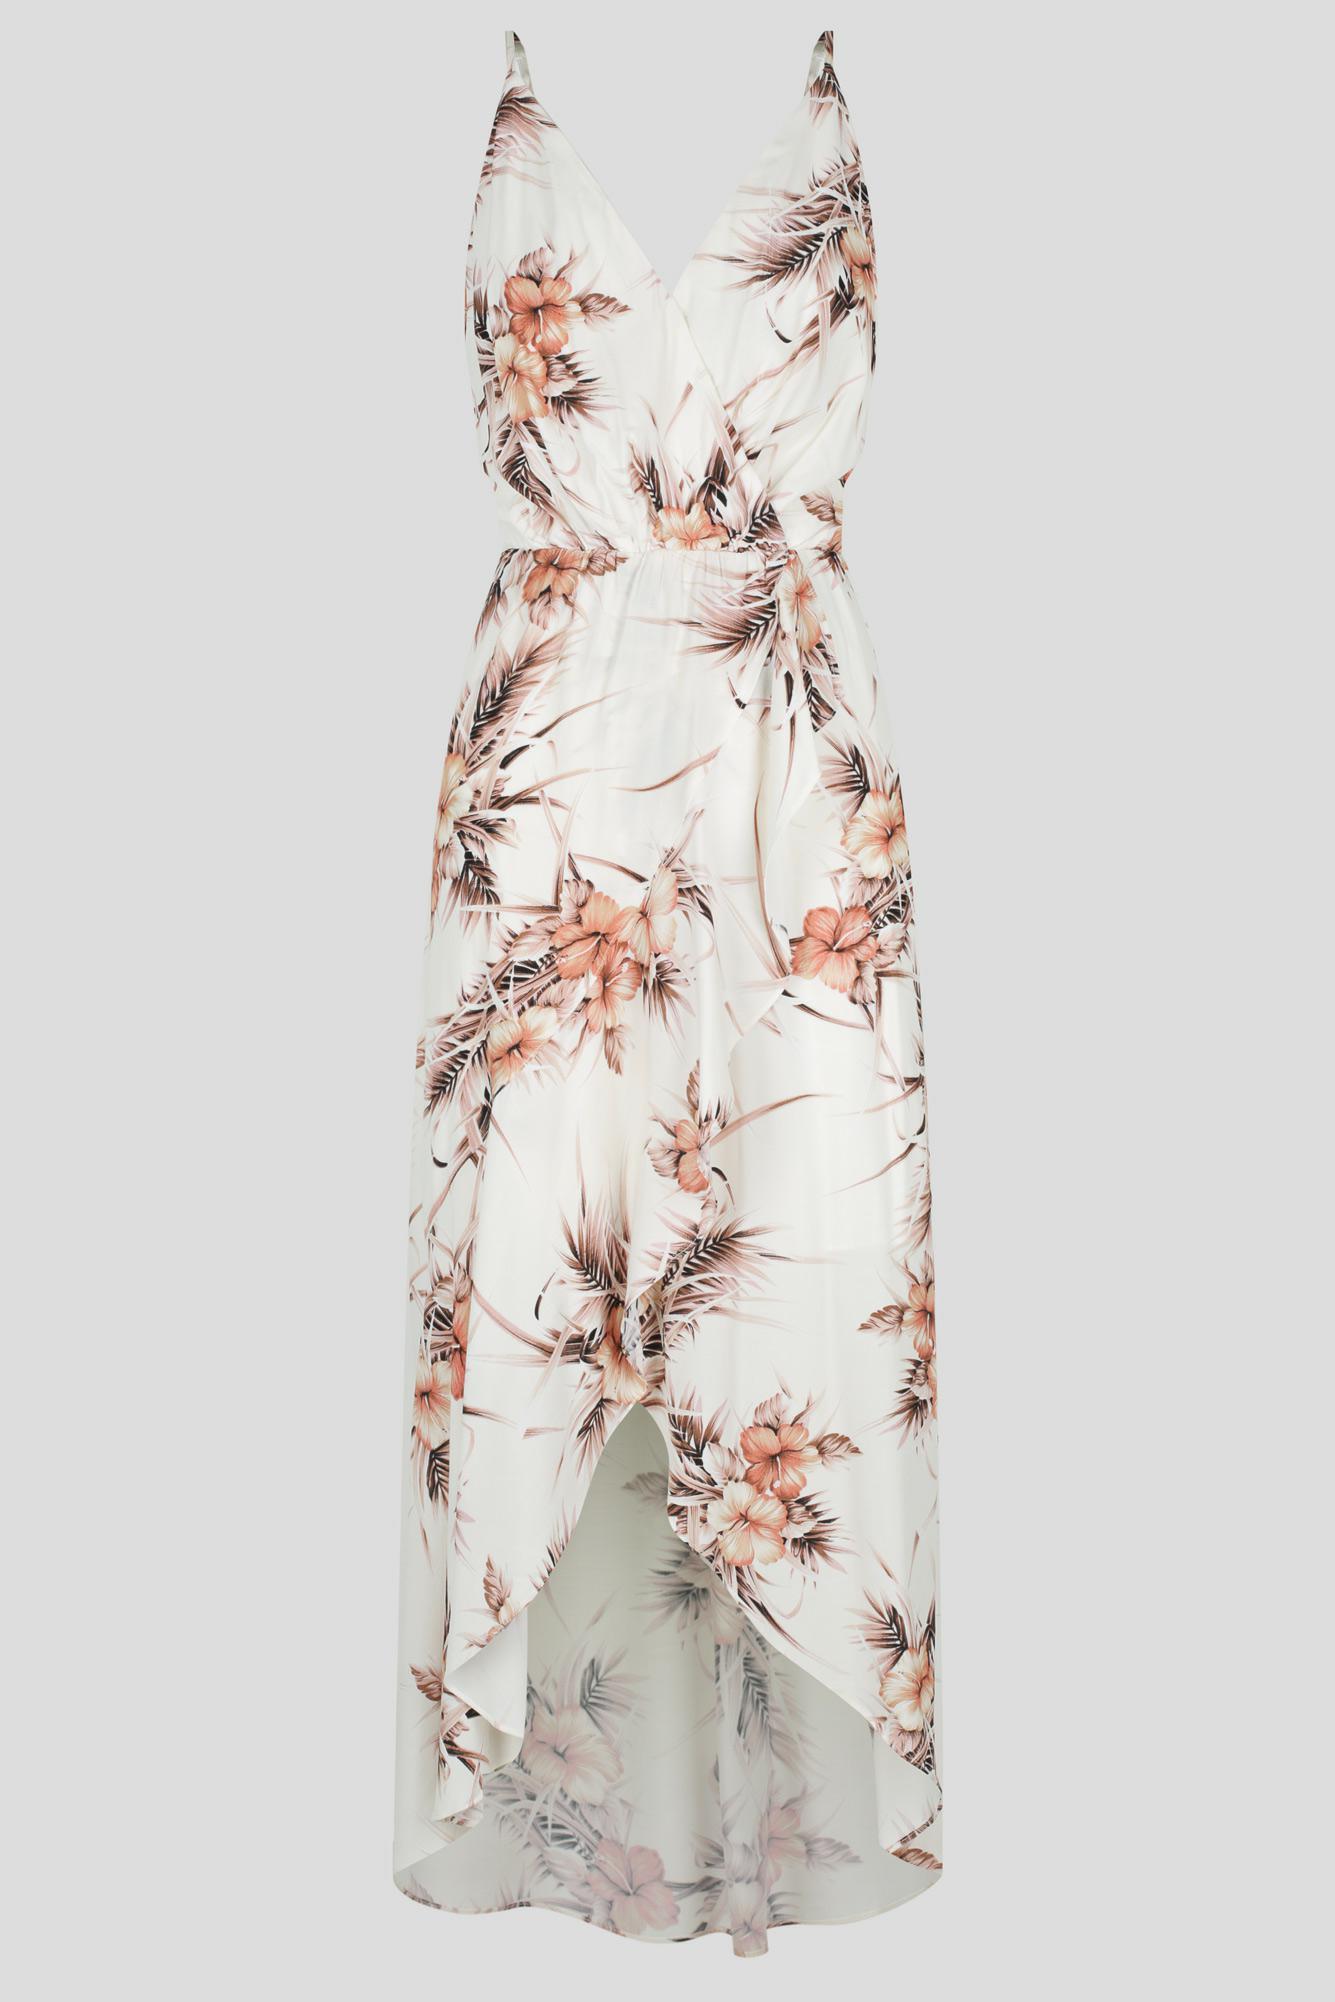 Arancia Maxi Dress Ladies Dress Colour is Blush Floral Print